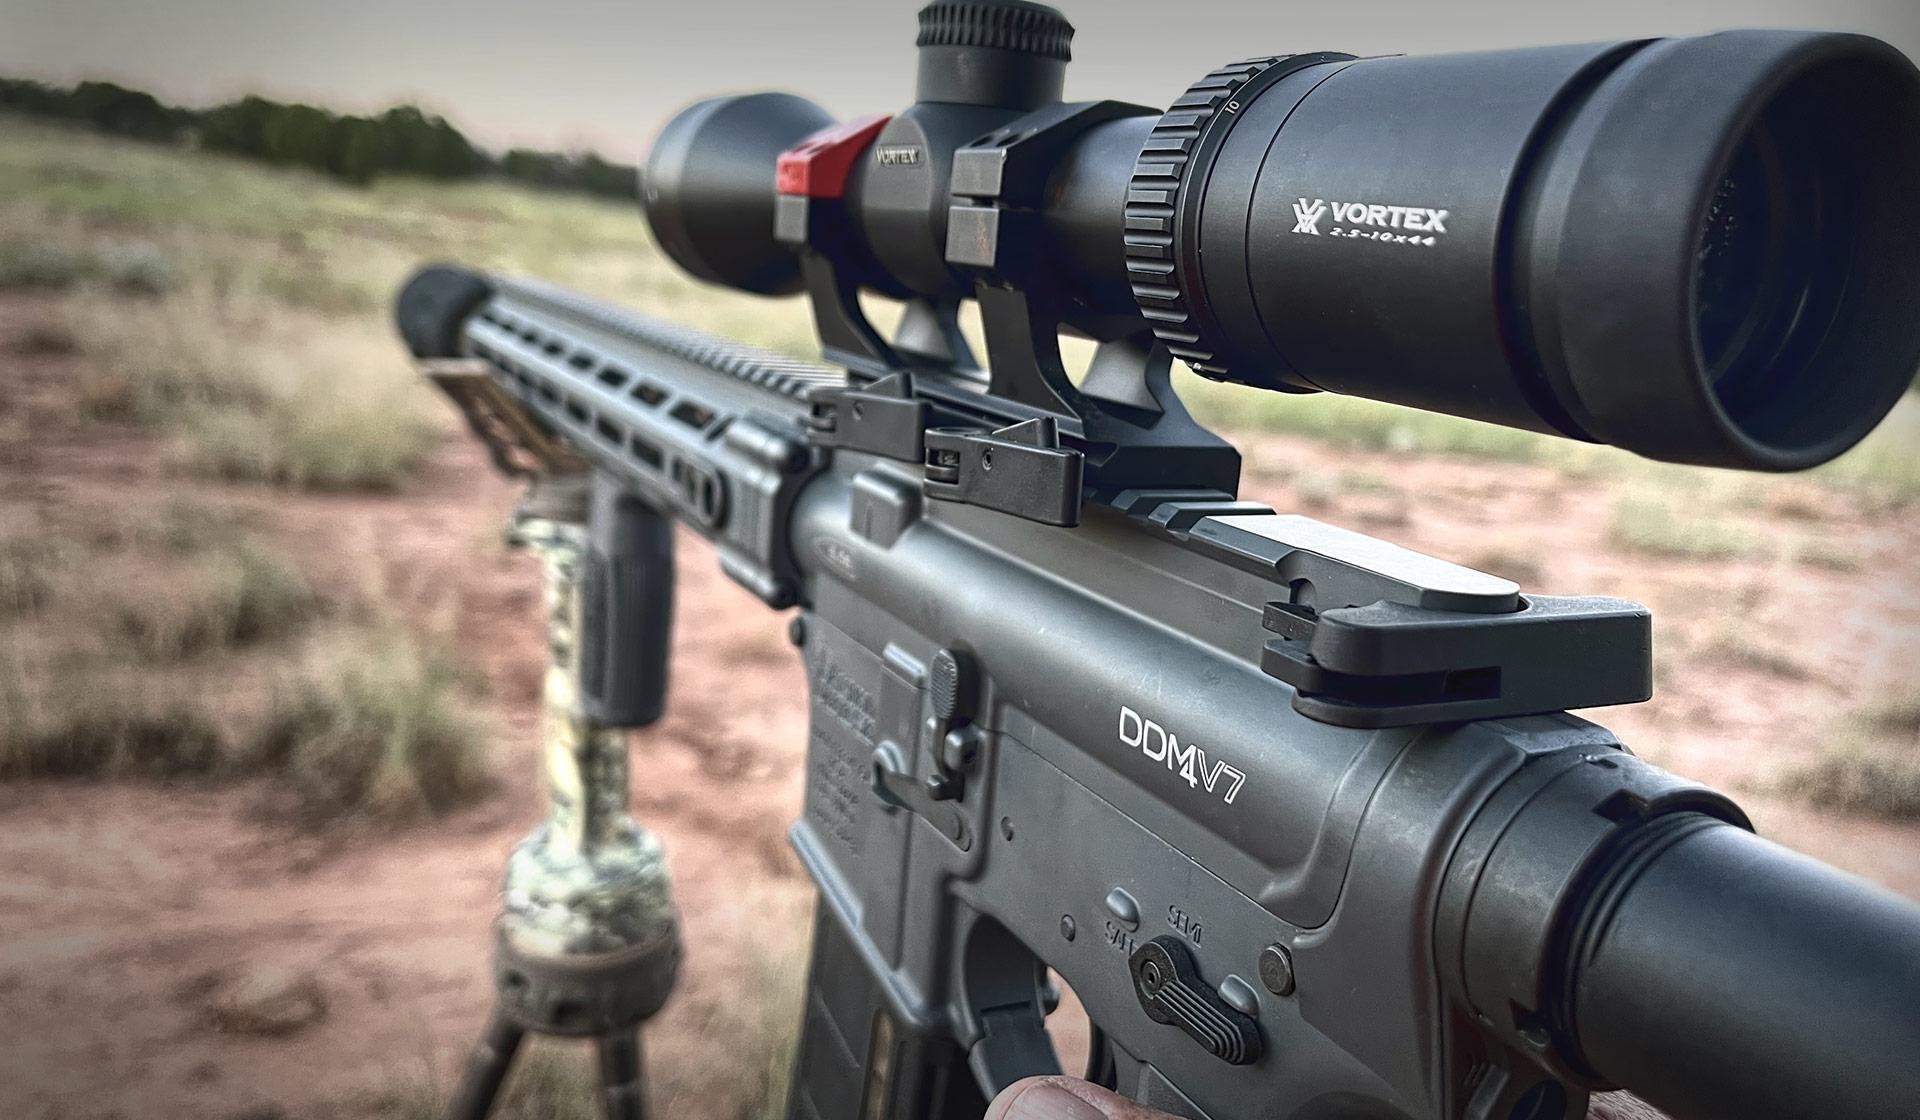 Predator Hunting with a DDM4V7